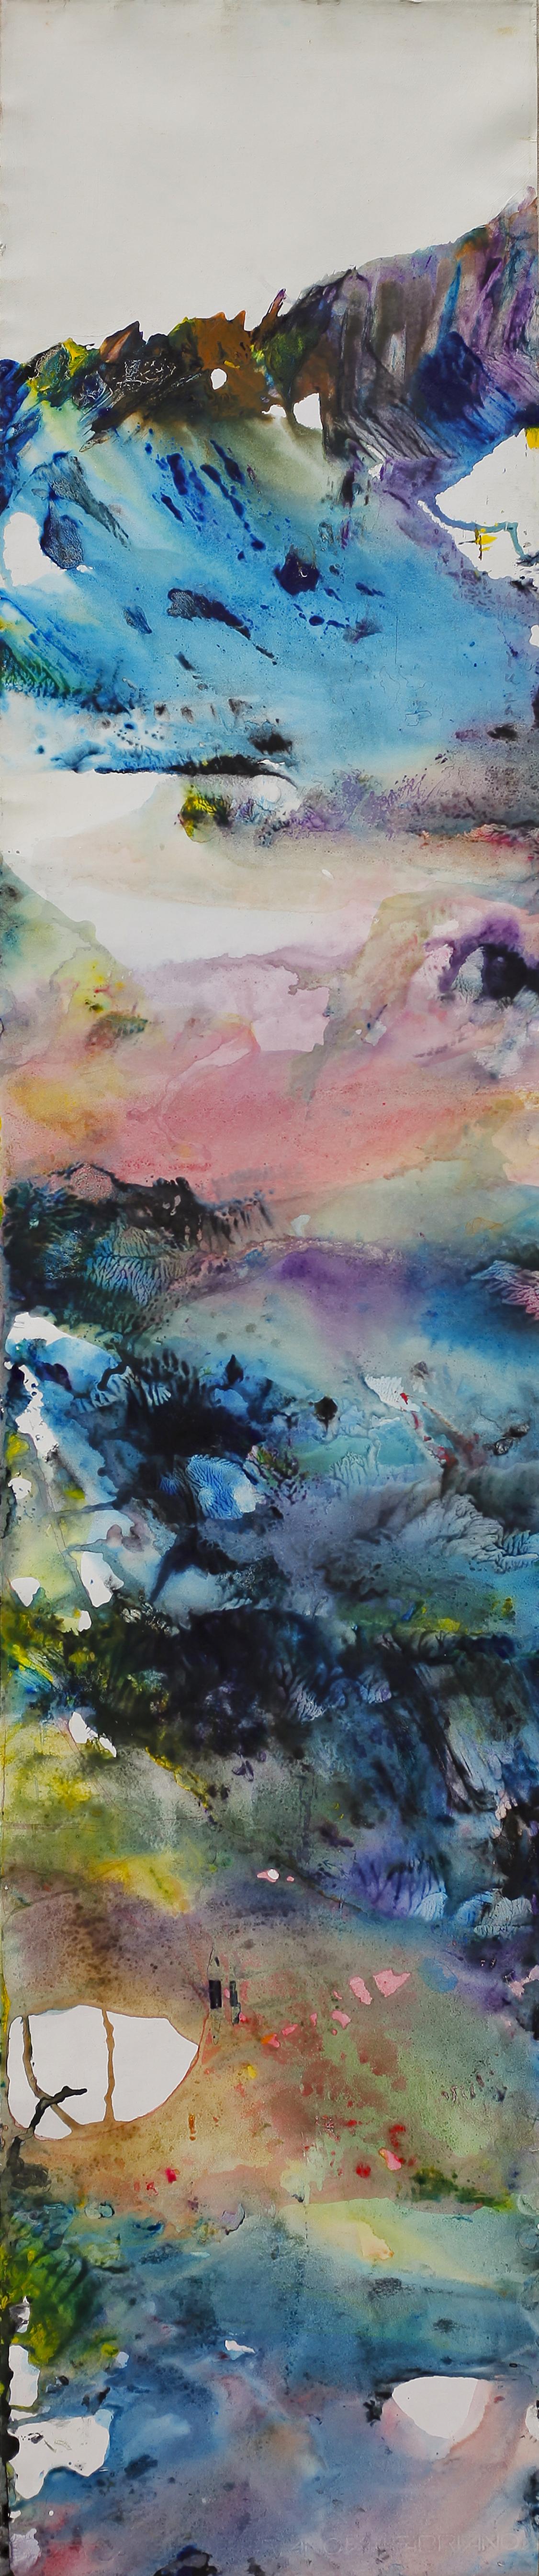 Yu Zhao, Champ printanier, acrylic/paper/canvas, 150x30cm, 2015